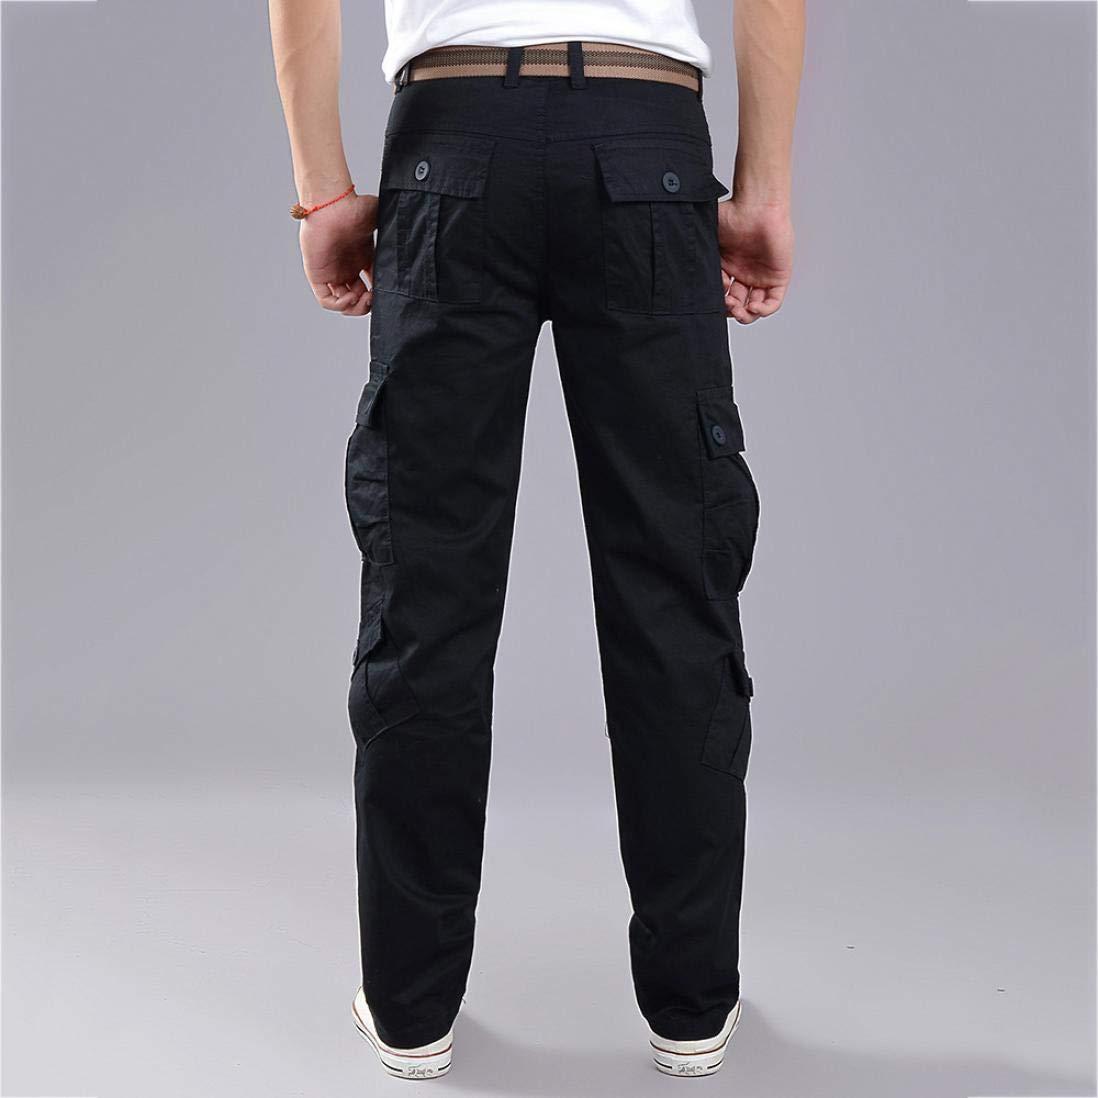 Realdo Clearance Fashion Army Trousers Multi-Pocket Combat Zipper Cargo Waist Work Casual Pants(38,Black) by Realdo (Image #4)